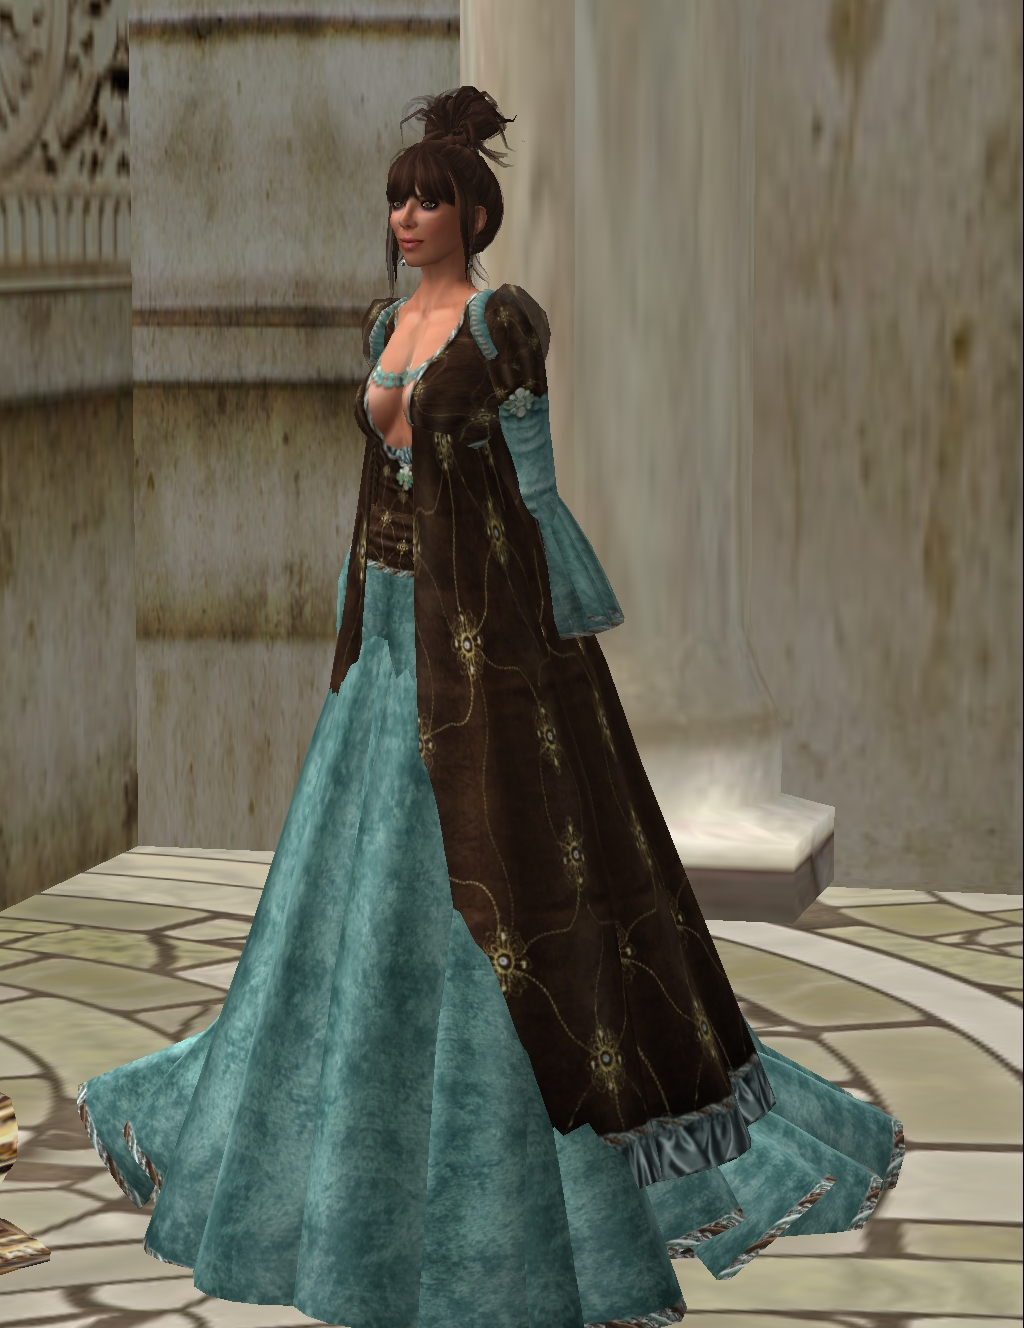 http://3.bp.blogspot.com/_fHcdFXy_4Bo/TOmI2DYEjhI/AAAAAAAAD8Q/FHp90k1Gw6Q/s1600/white+armory++GG+dress_001.jpg